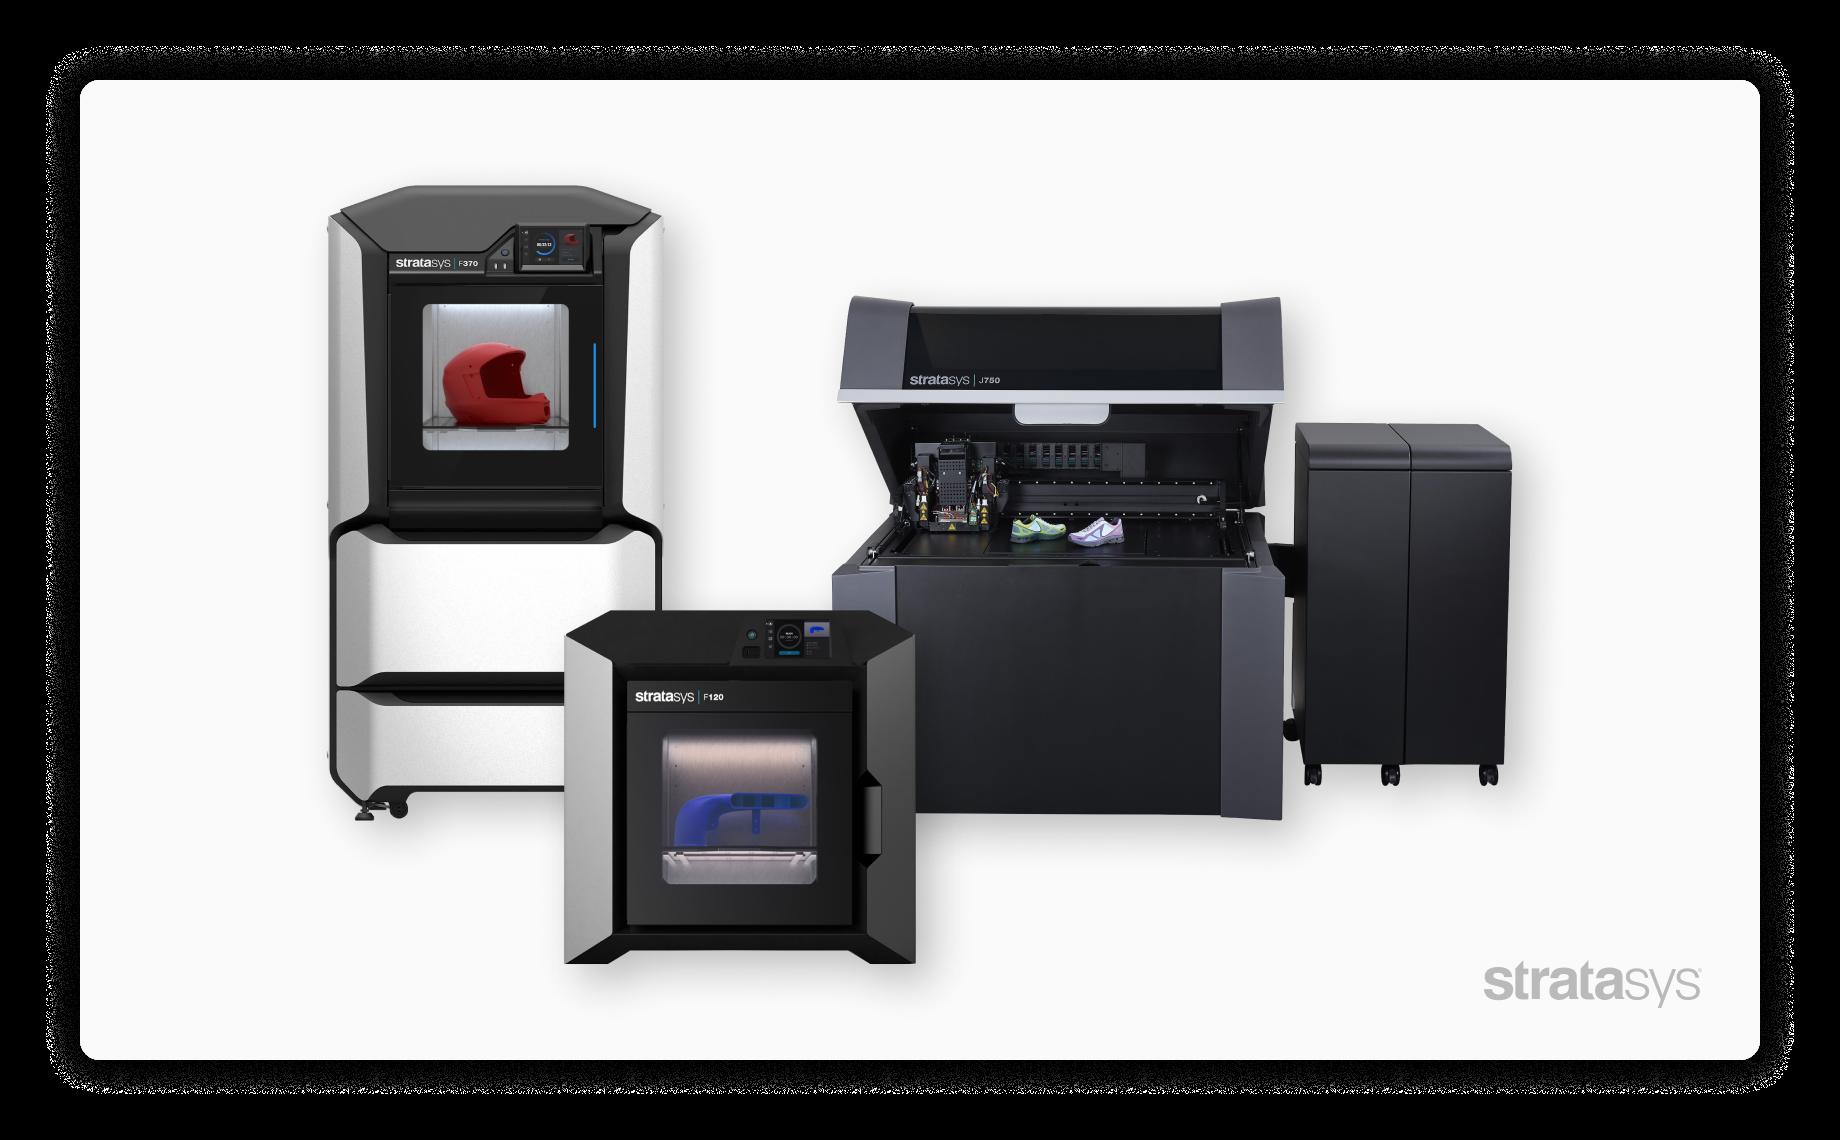 Print multiple printers